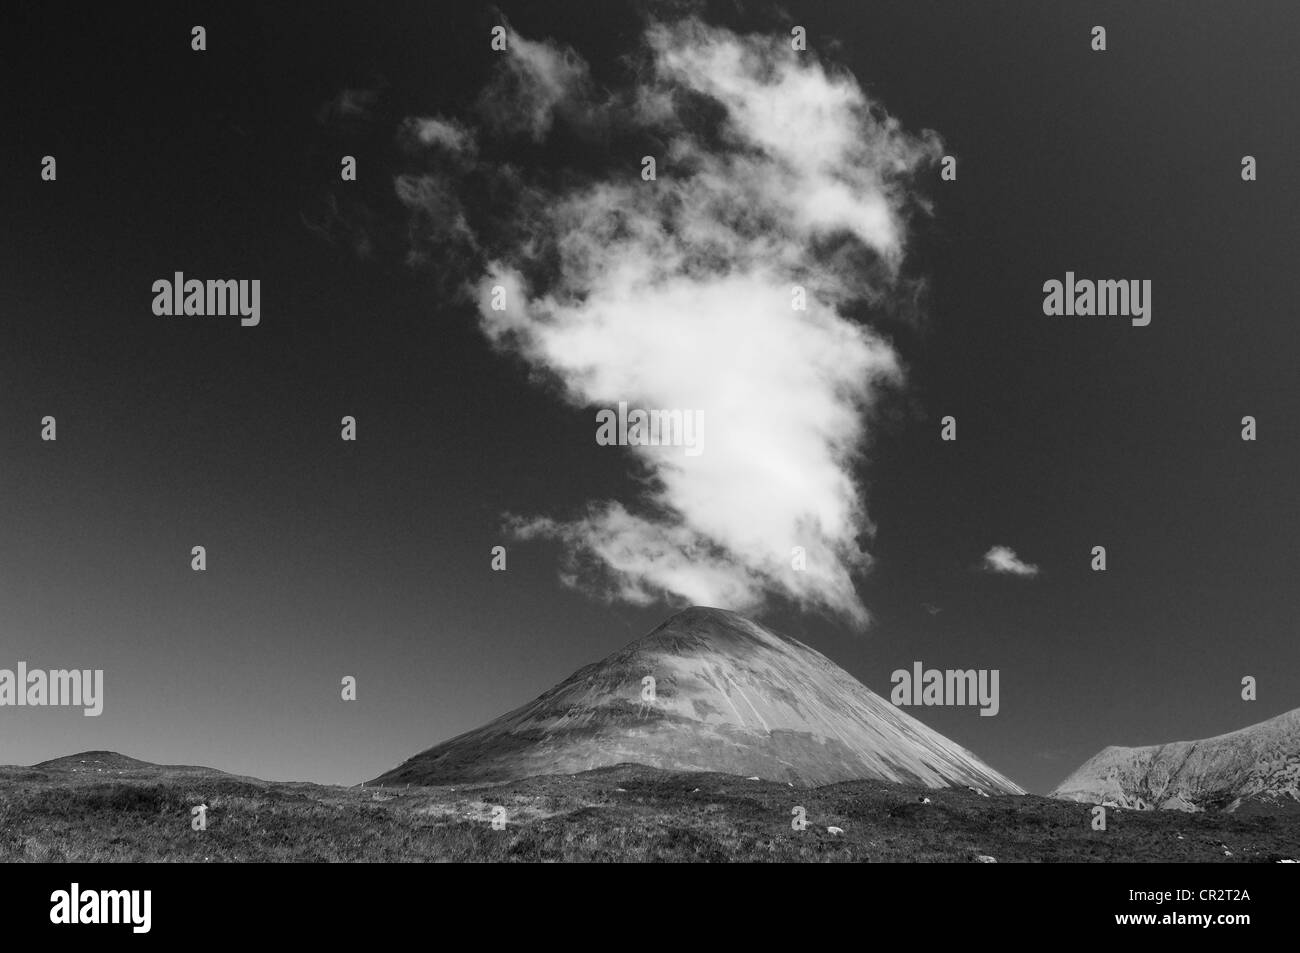 Plume of cloud above Sgurr Mhairi, Glamaig, Isle of Skye, Inner Hebrides, Scotland - Stock Image